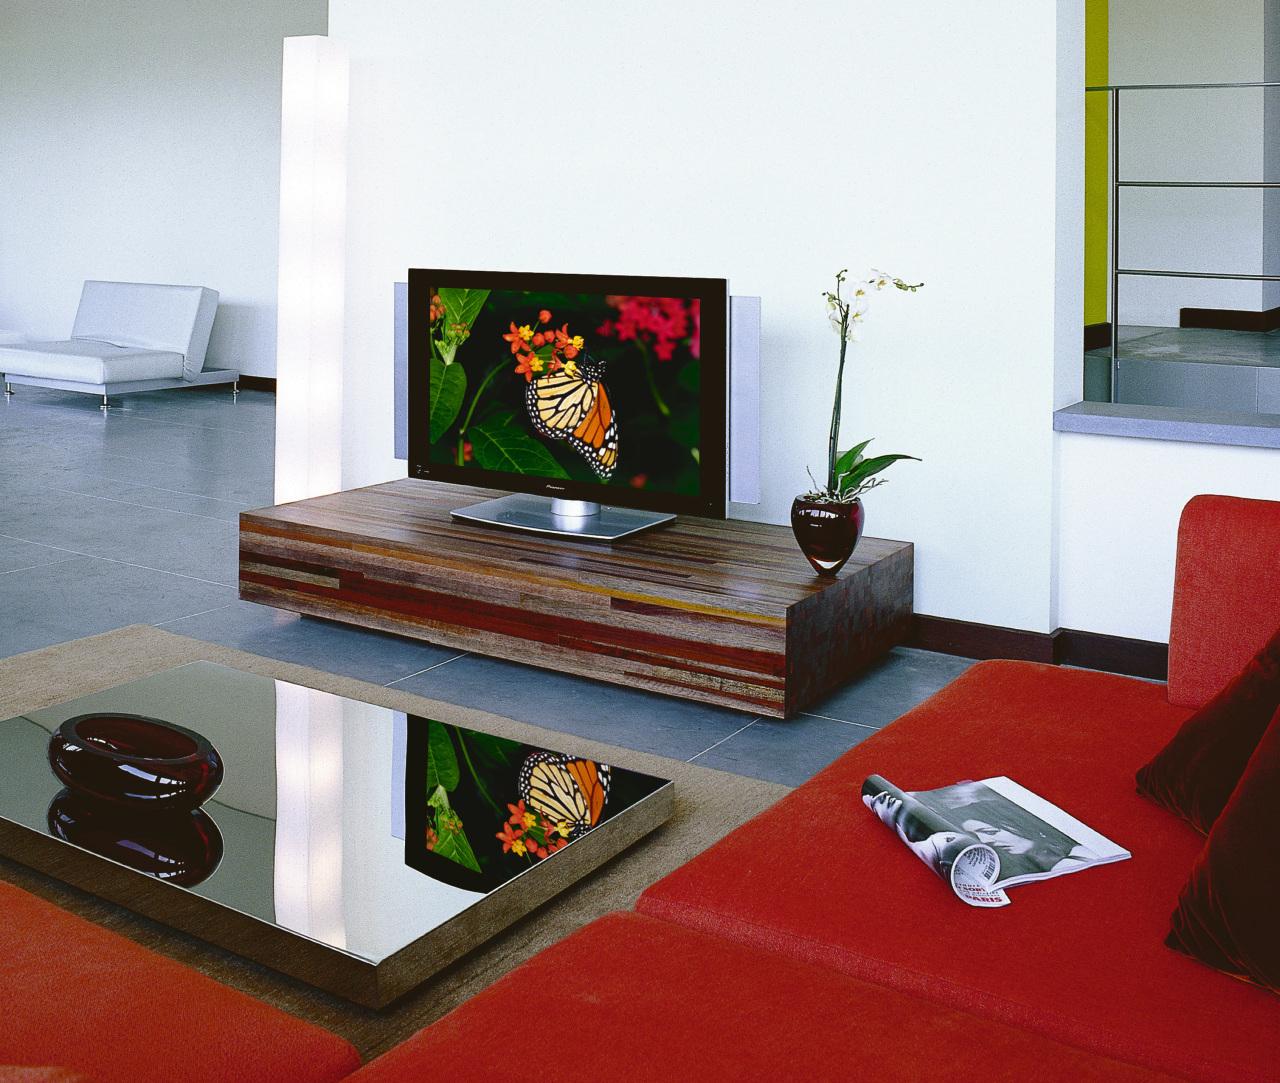 Interior vie wof lounge and living floor, flooring, furniture, interior design, living room, table, white